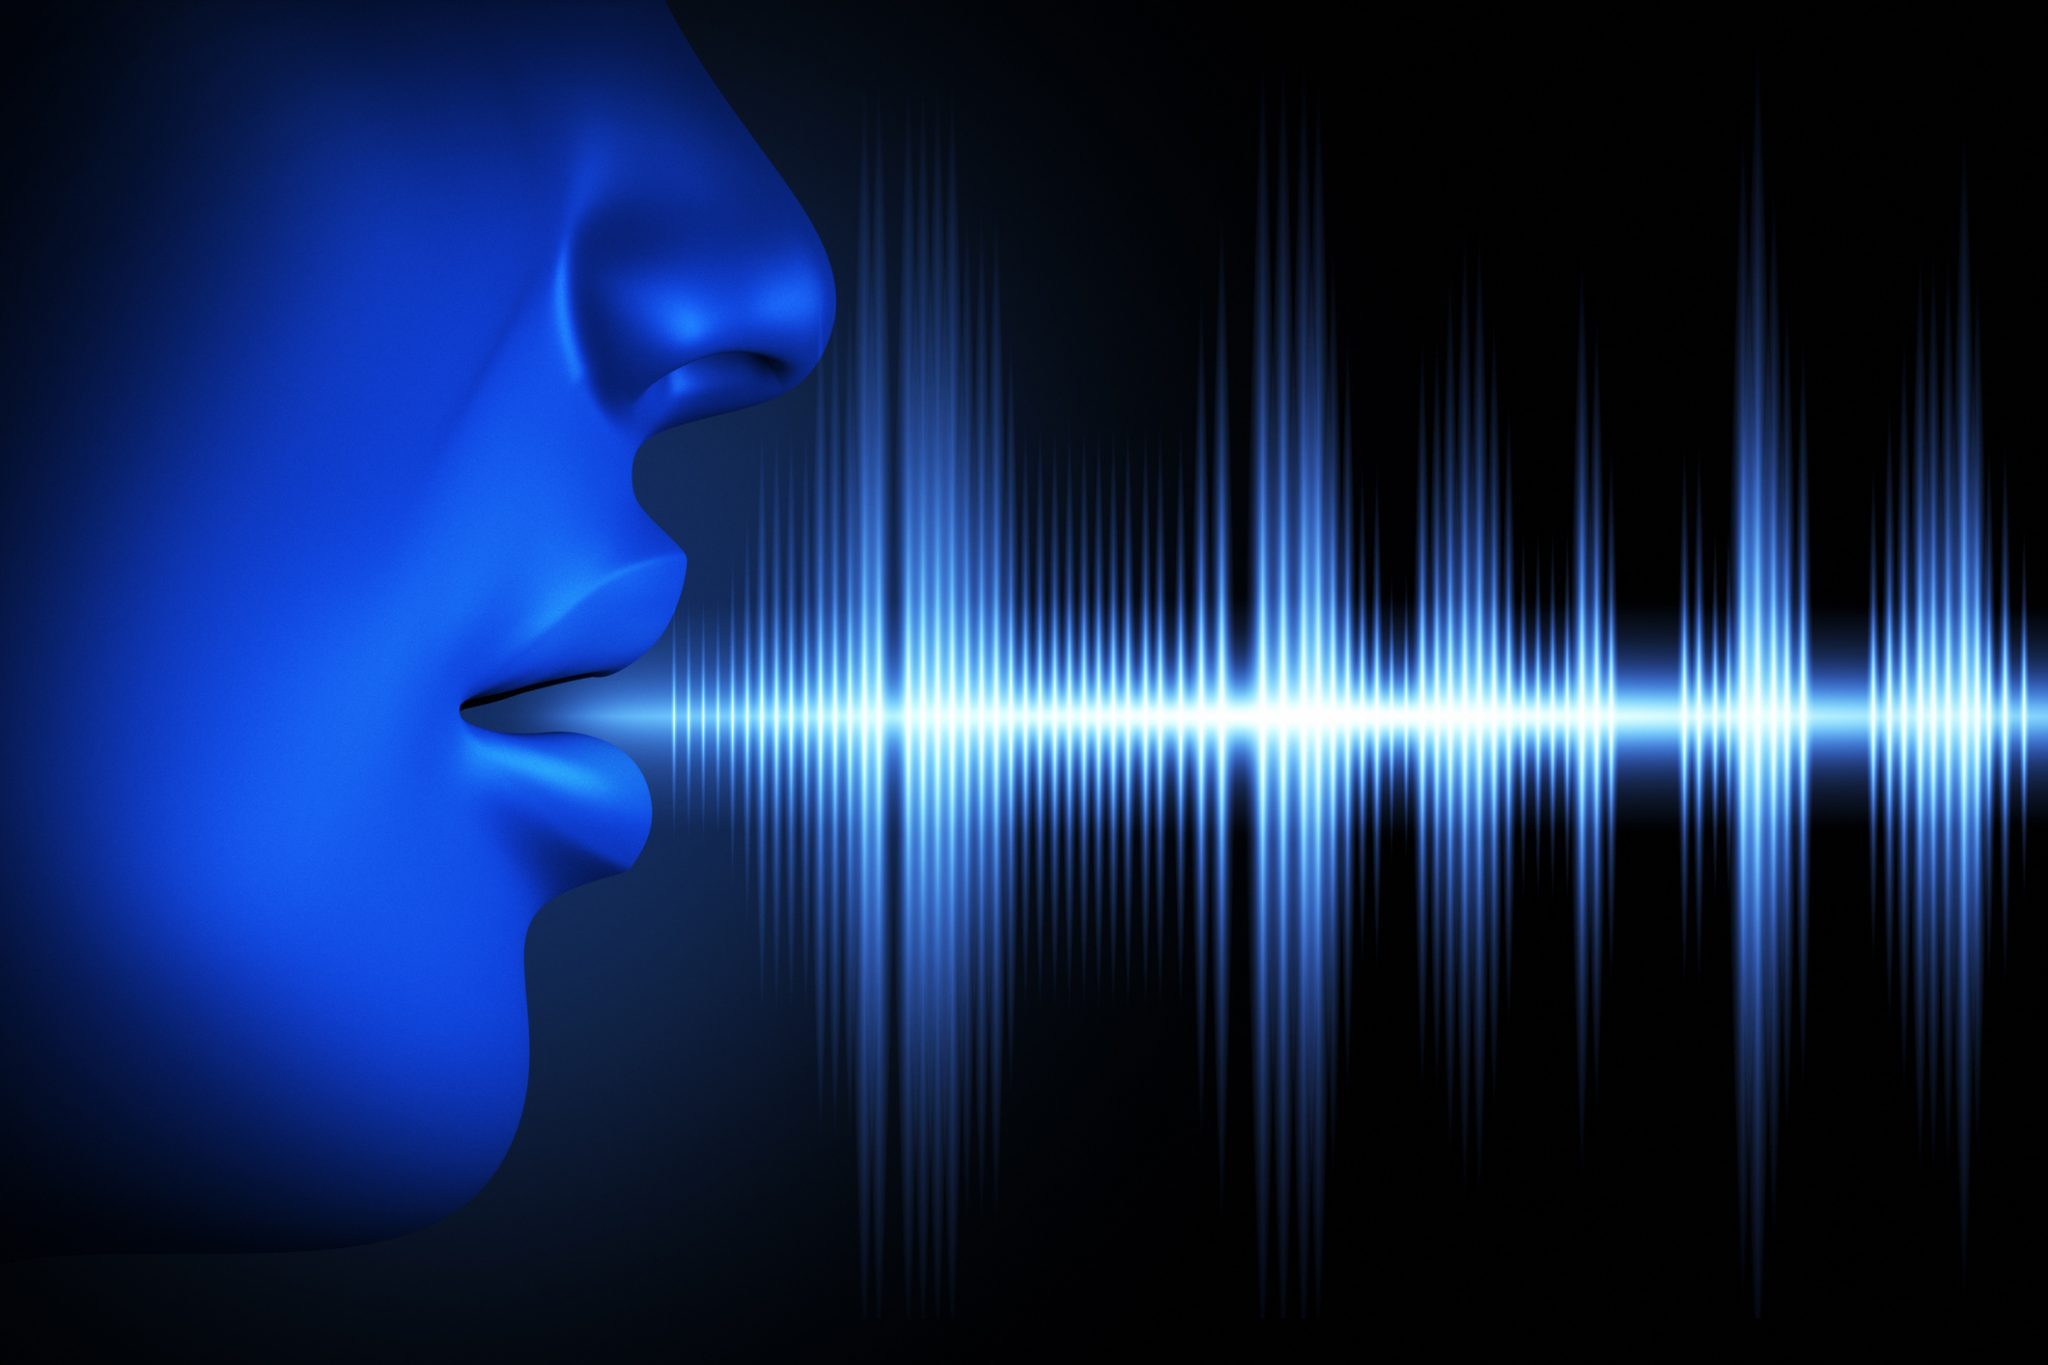 ai-startup-lyrebird-can-clone-human-voices